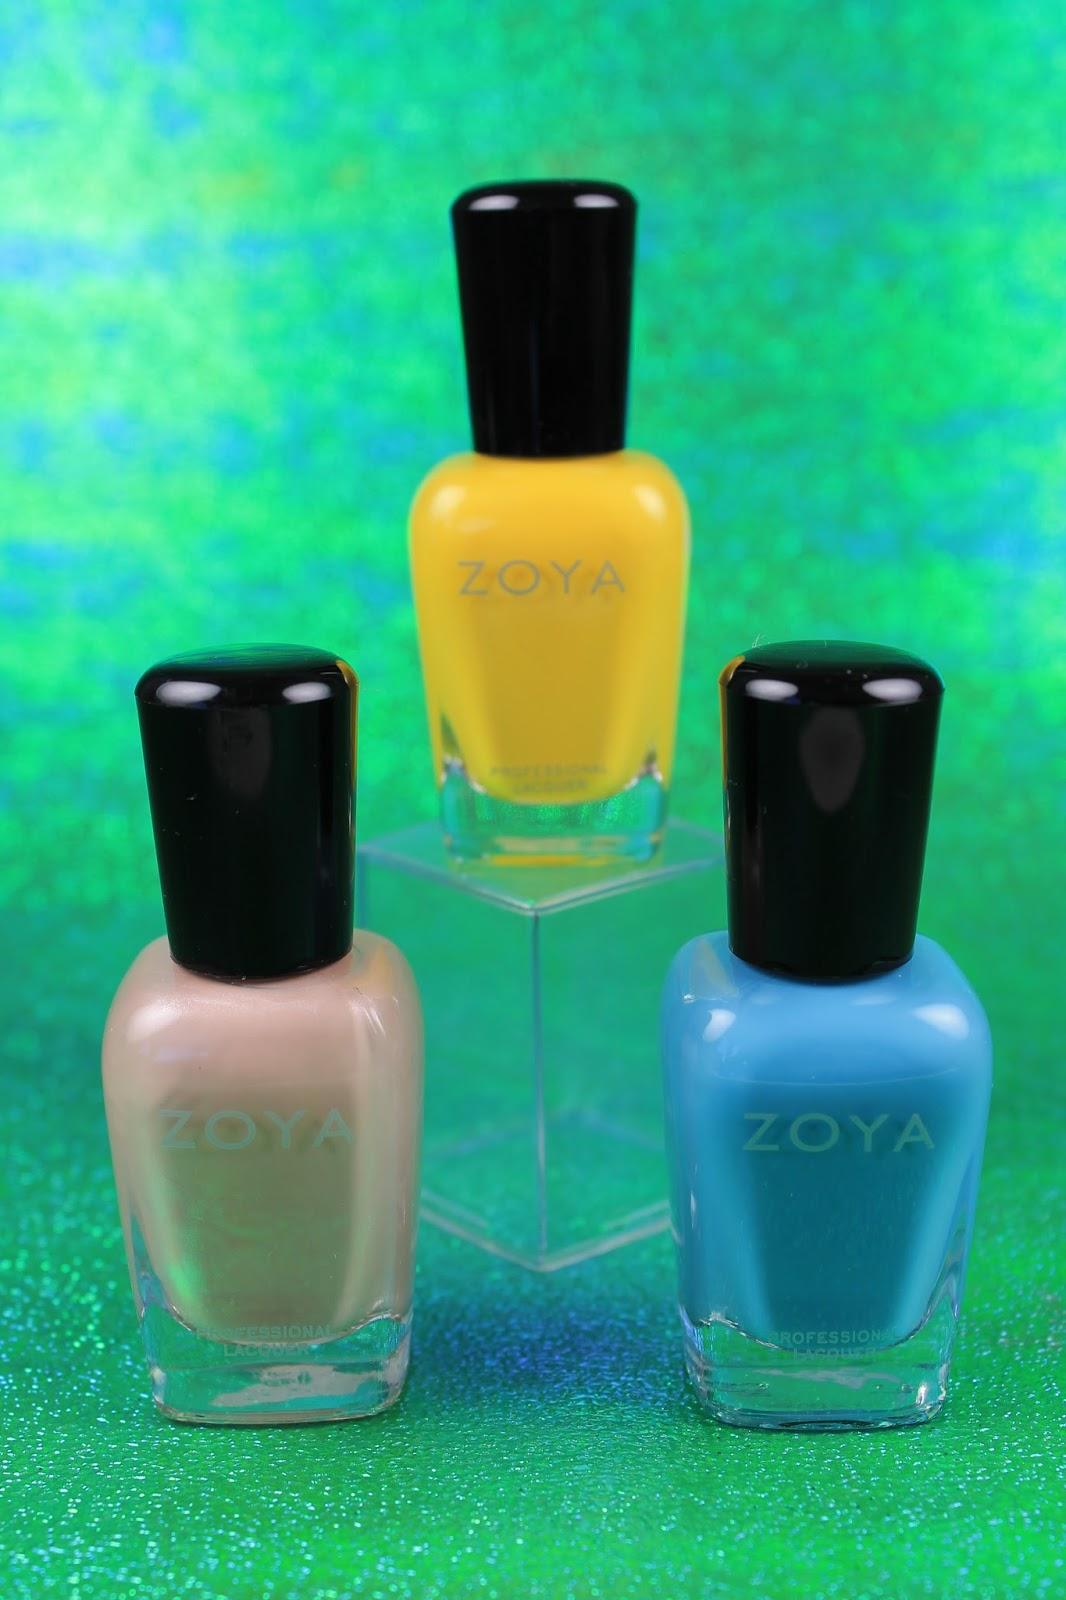 Shine Beauty Beacon M M S Candy Mani: Shine Beauty Beacon: Summer Vacay Tip Trends: Sun, Sand